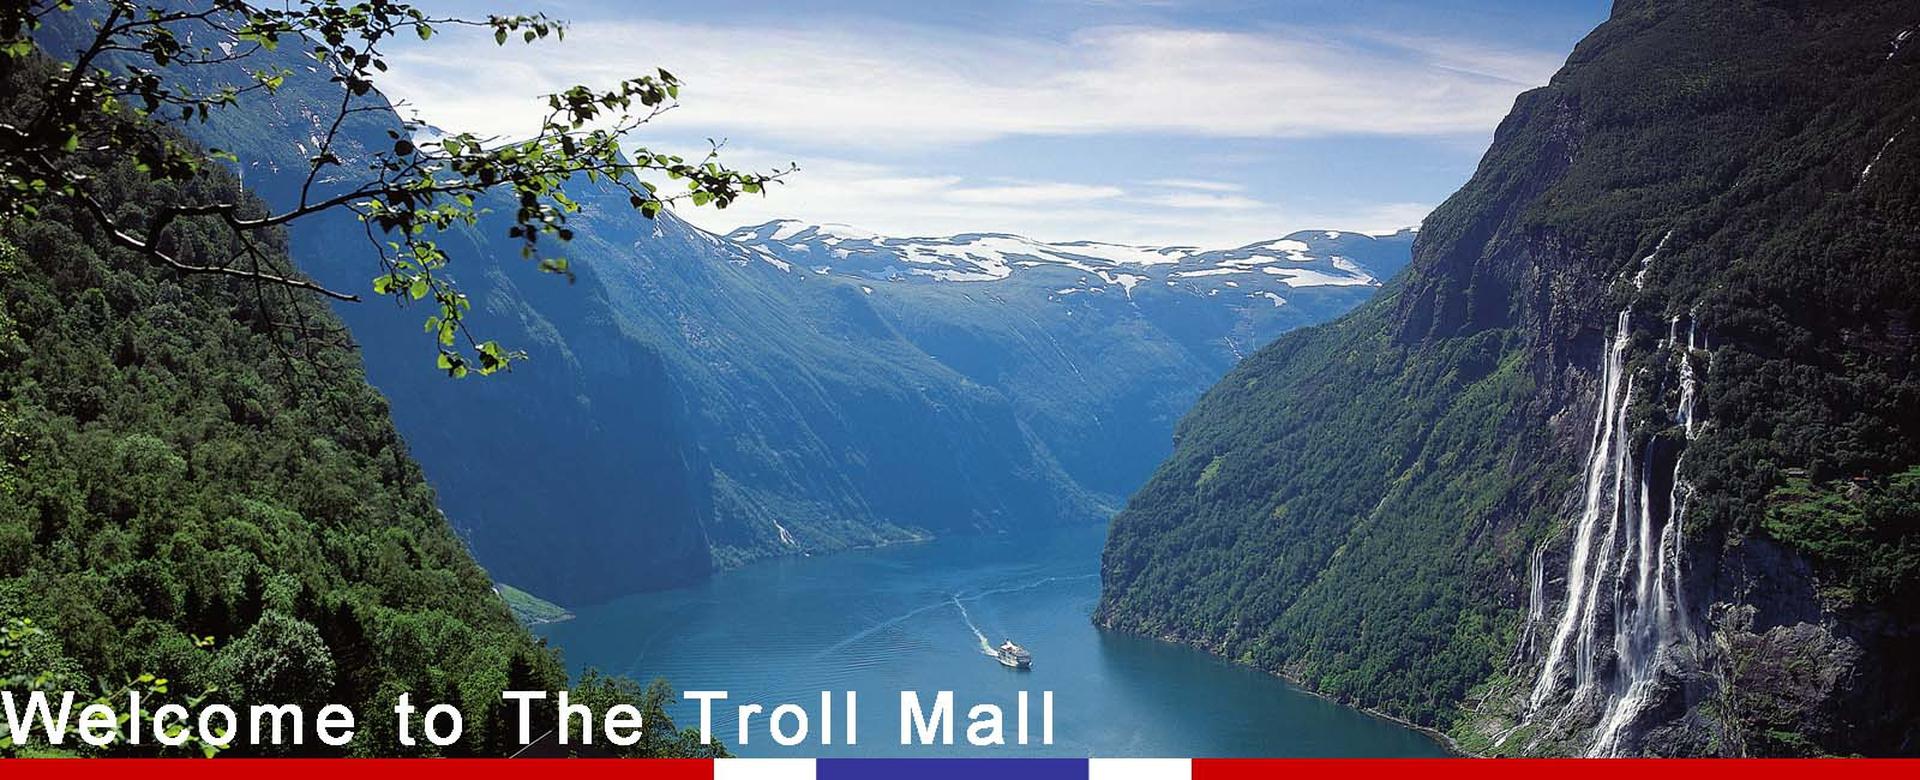 The troll mall